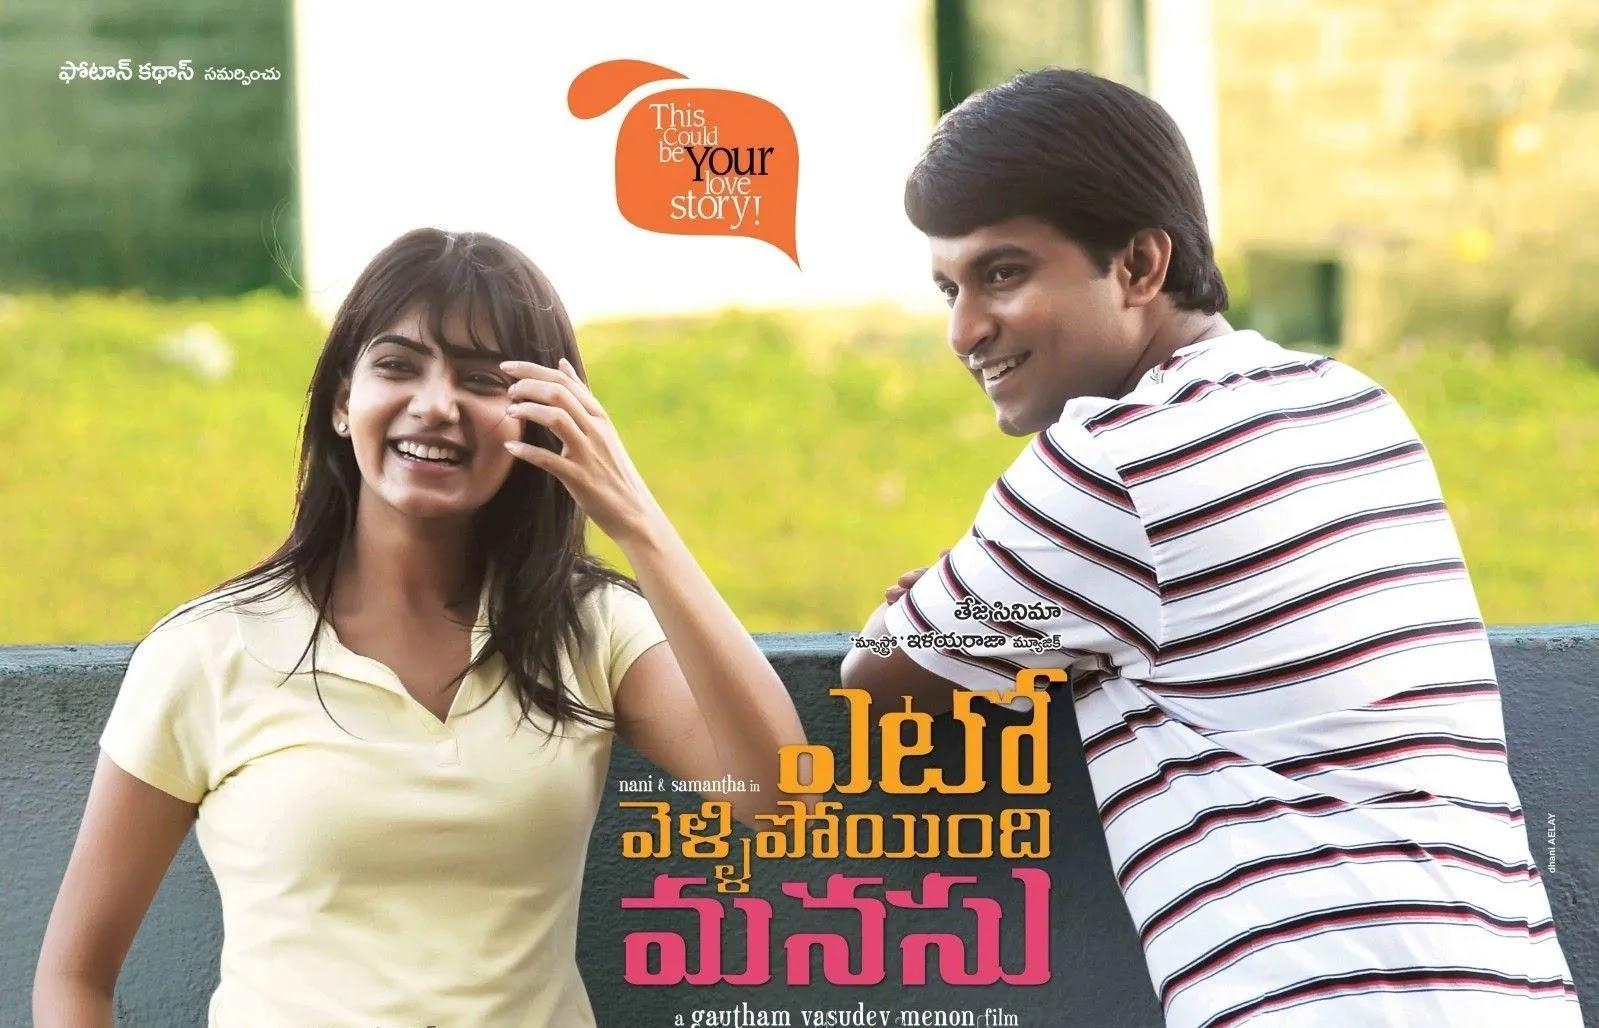 Yeto Vellipoyindhi Manasu - Telugu Full Movie (2012) - Nani, Samantha Ruth Prabhu - Movierulz